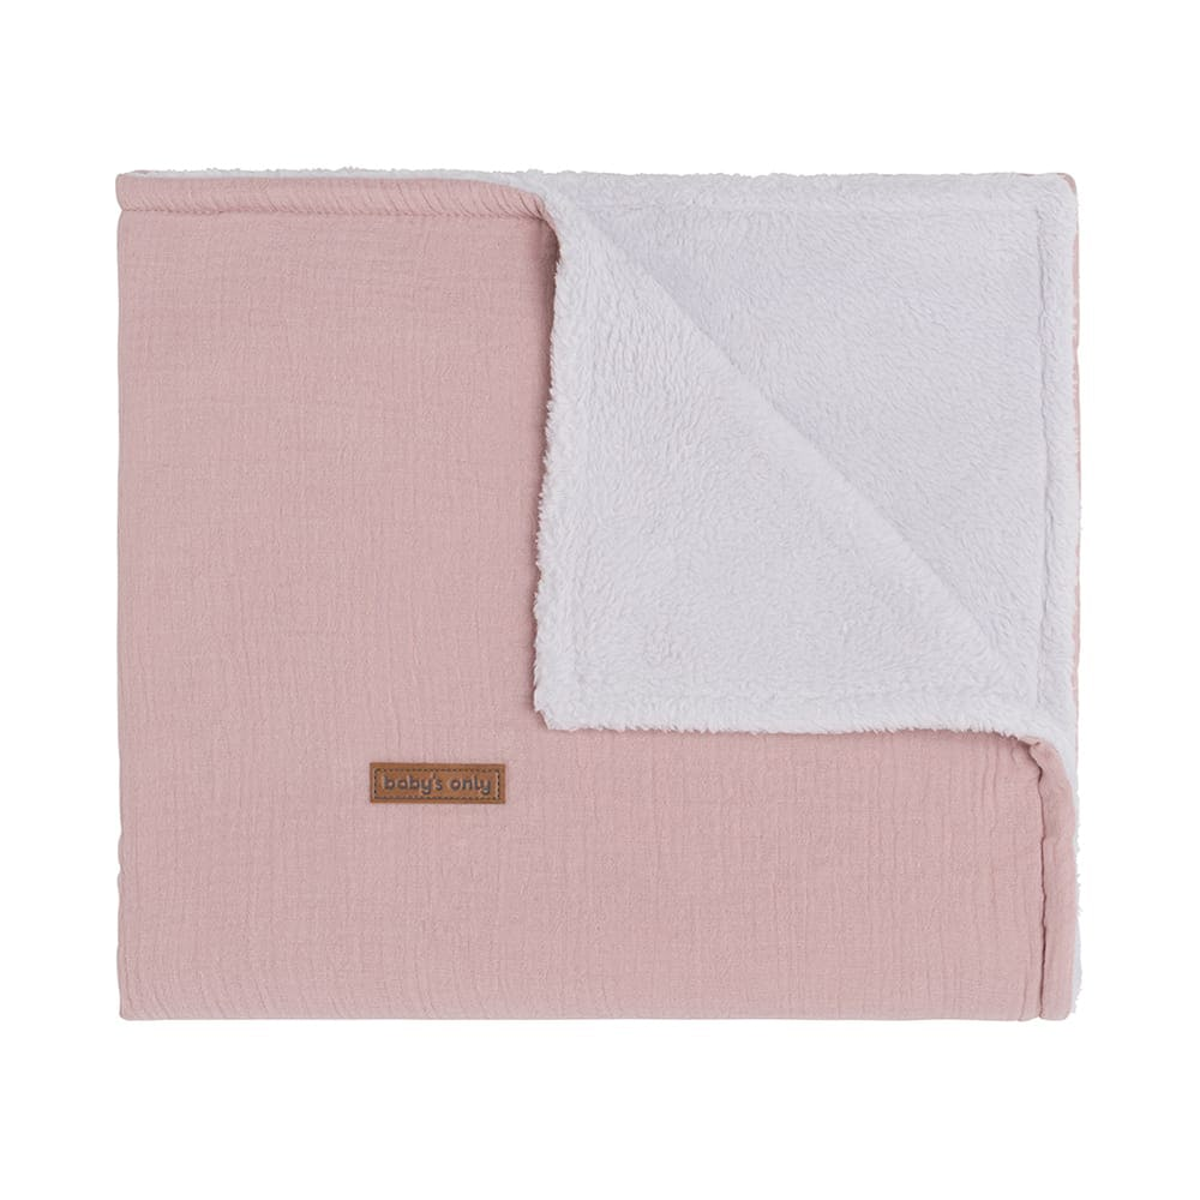 babys only 0231121 ledikantdeken teddy breeze baby roze 1